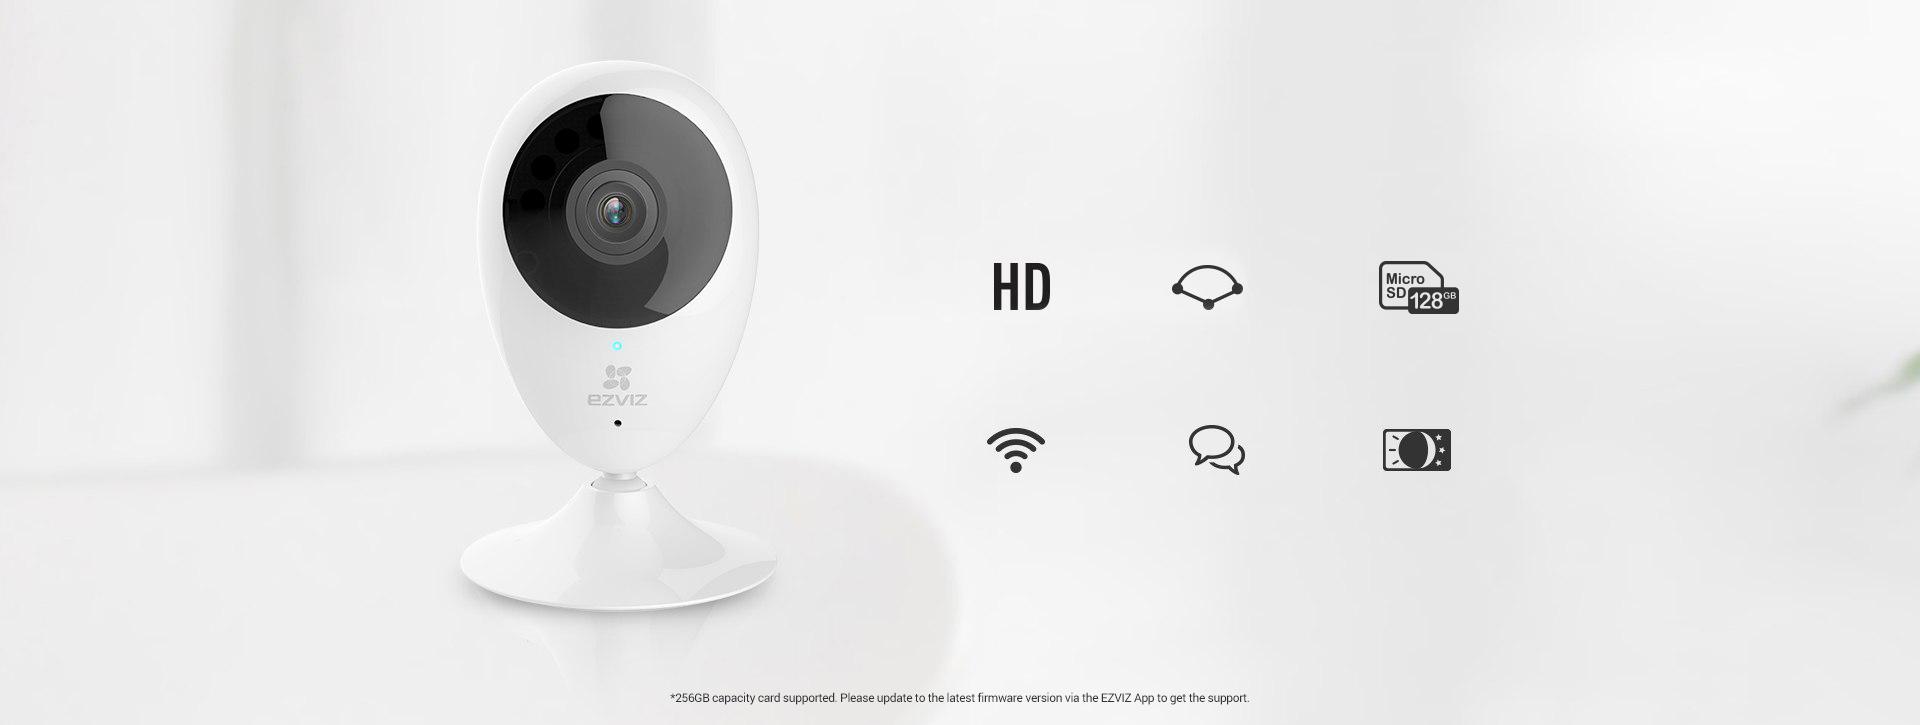 C2C - EZVIZ Wi-Fi Security Camera